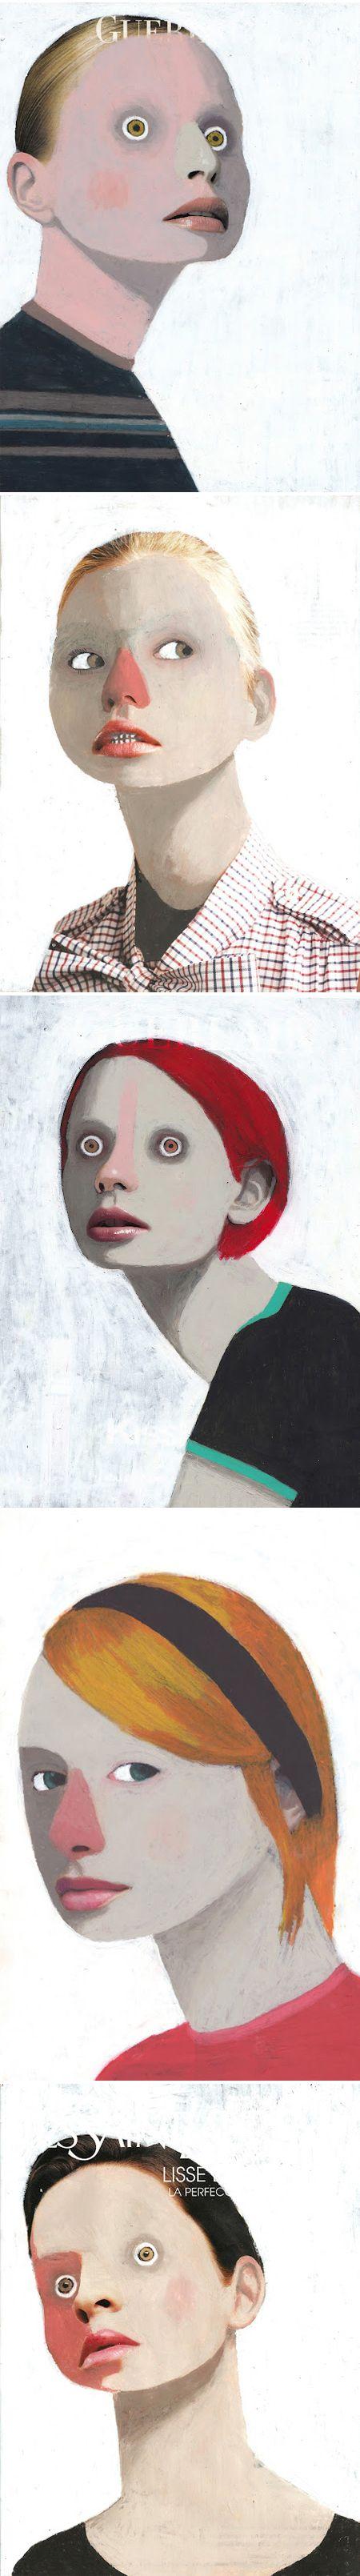 Barcelona based artist Guim Tió Zarraluki. oil pastel over top magazine photos.